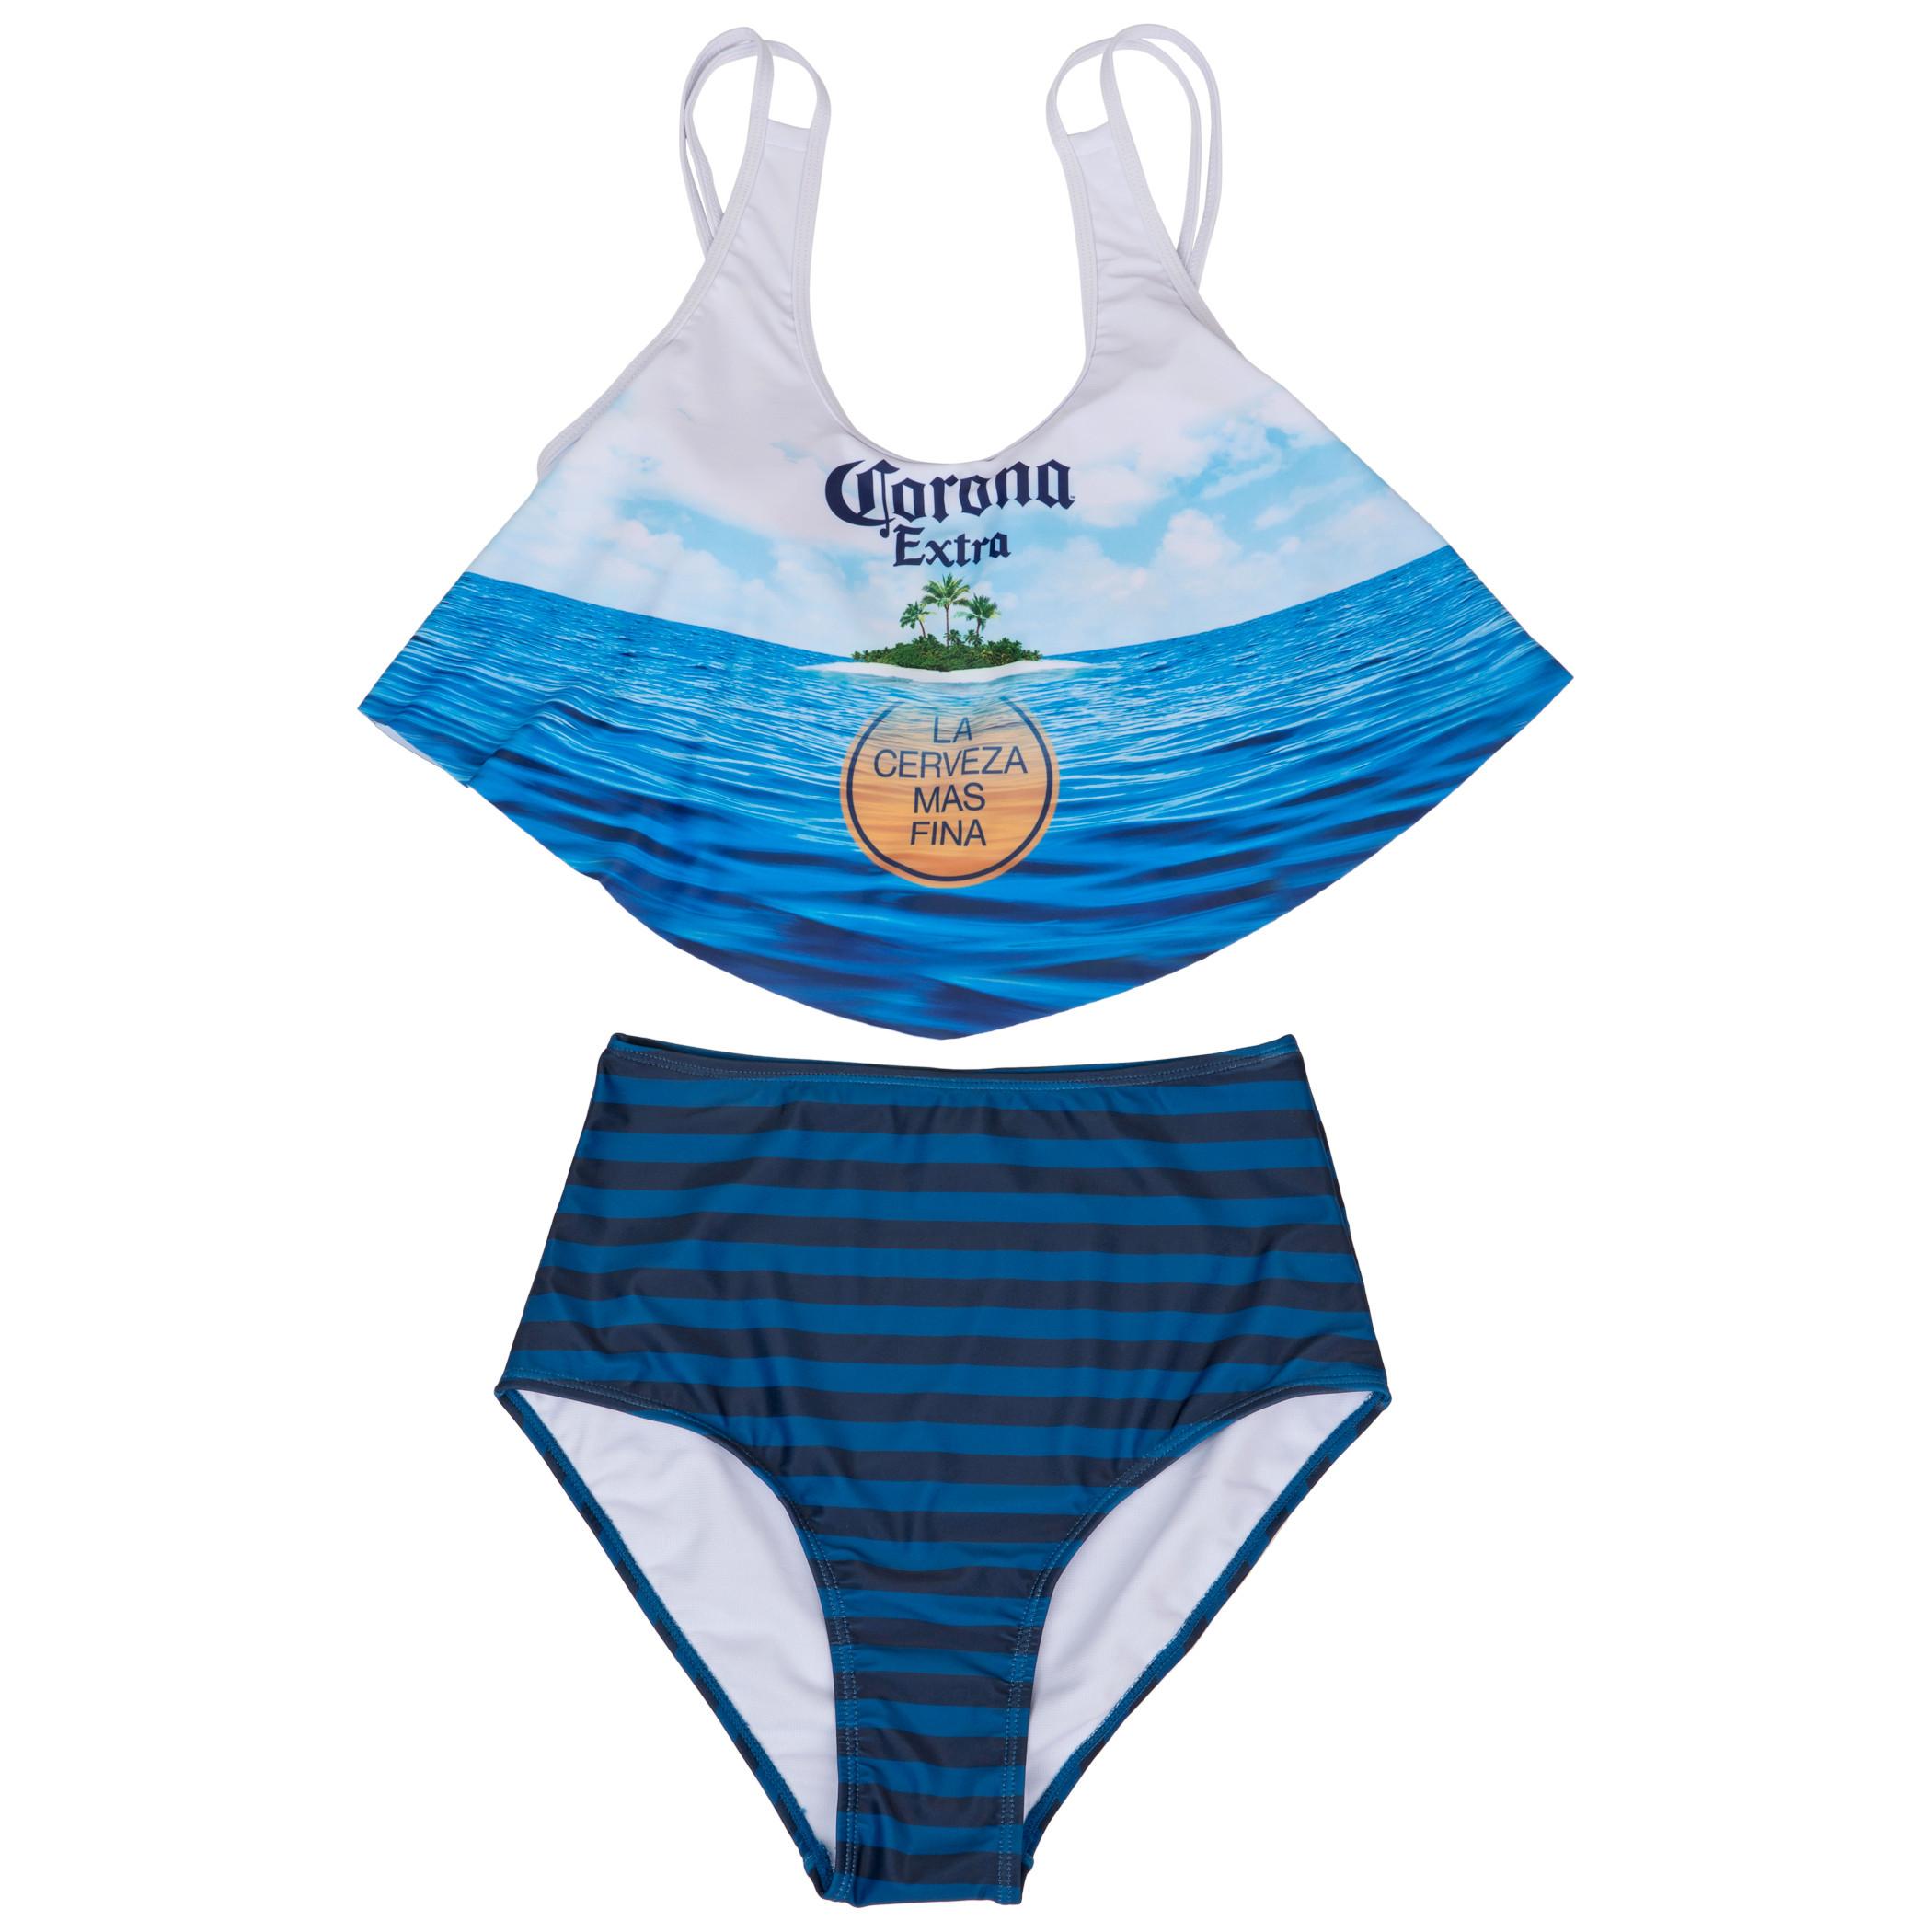 Corona Extra Beach Scene 2-Piece Ruffled Swimsuit